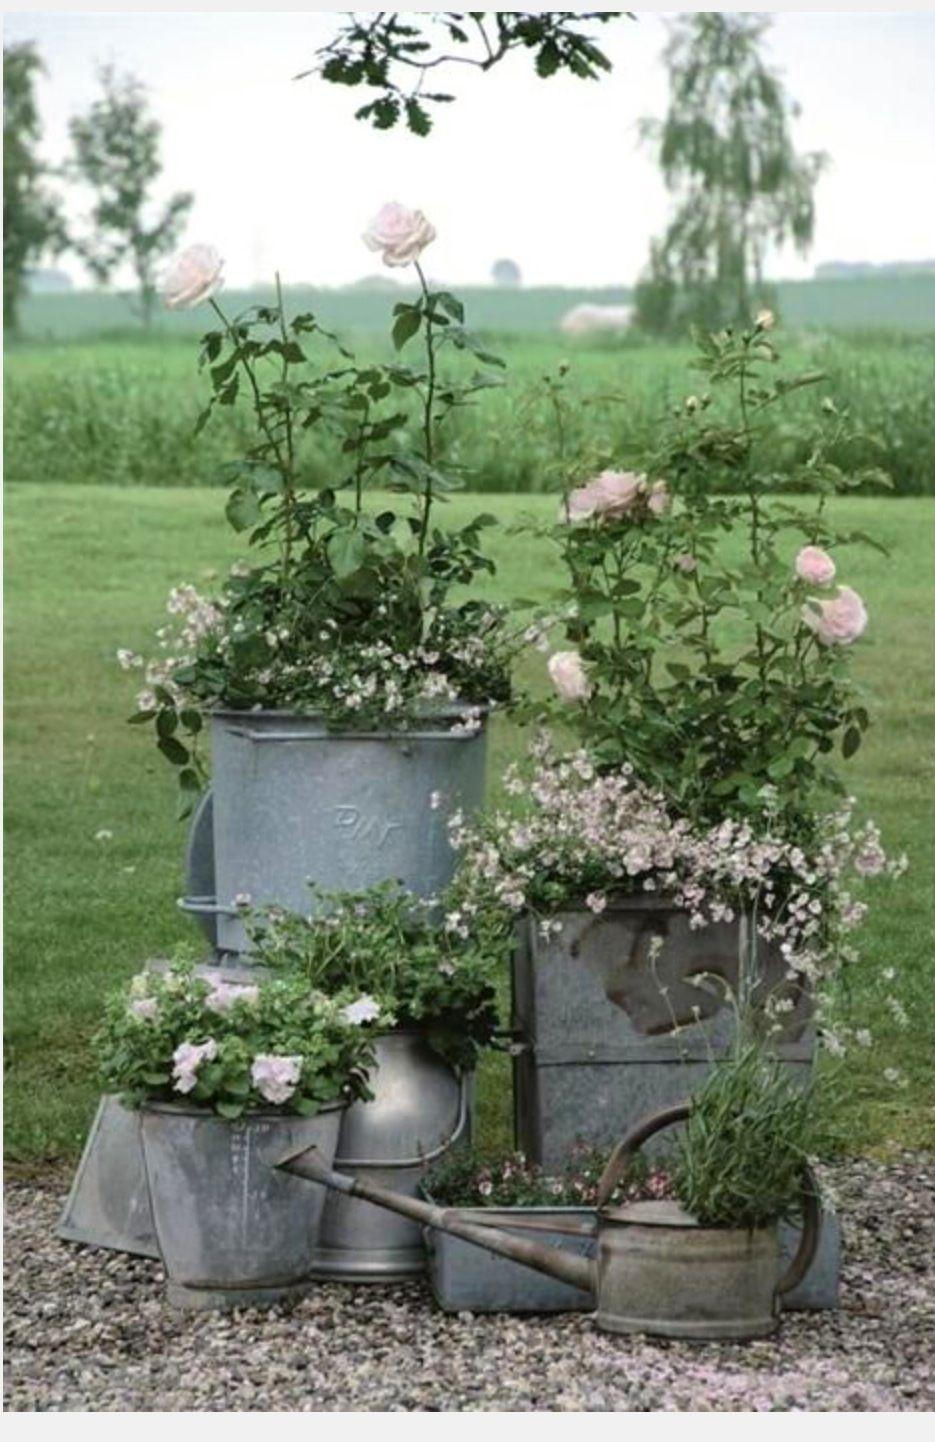 Great Idea Use Old Tubs And Such To Create A Container Garden Country Chic Garten Garten Deko Garten Ideen